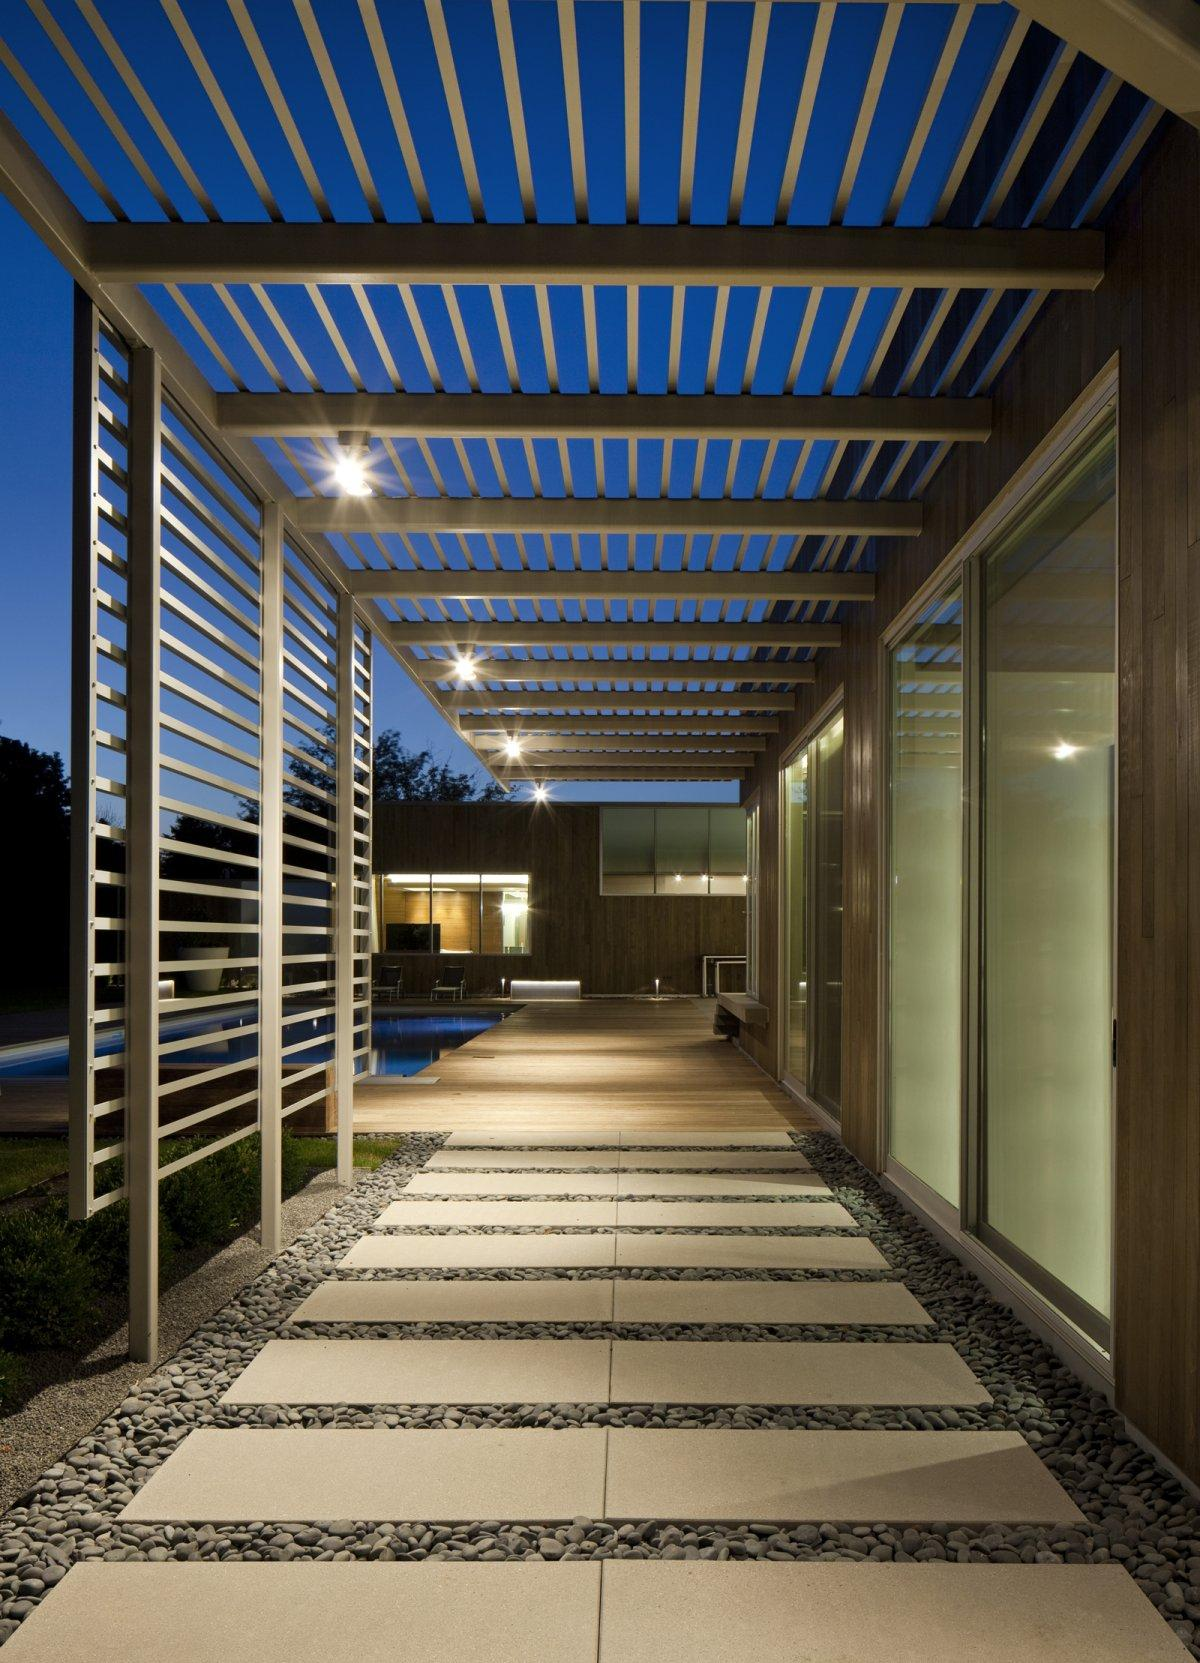 TACKarchitects, ART[house], частный дом Омаха, дома в Небраске, особняки в Америке, Kaufmann House, роскошные дома в Америке, американский частный дом